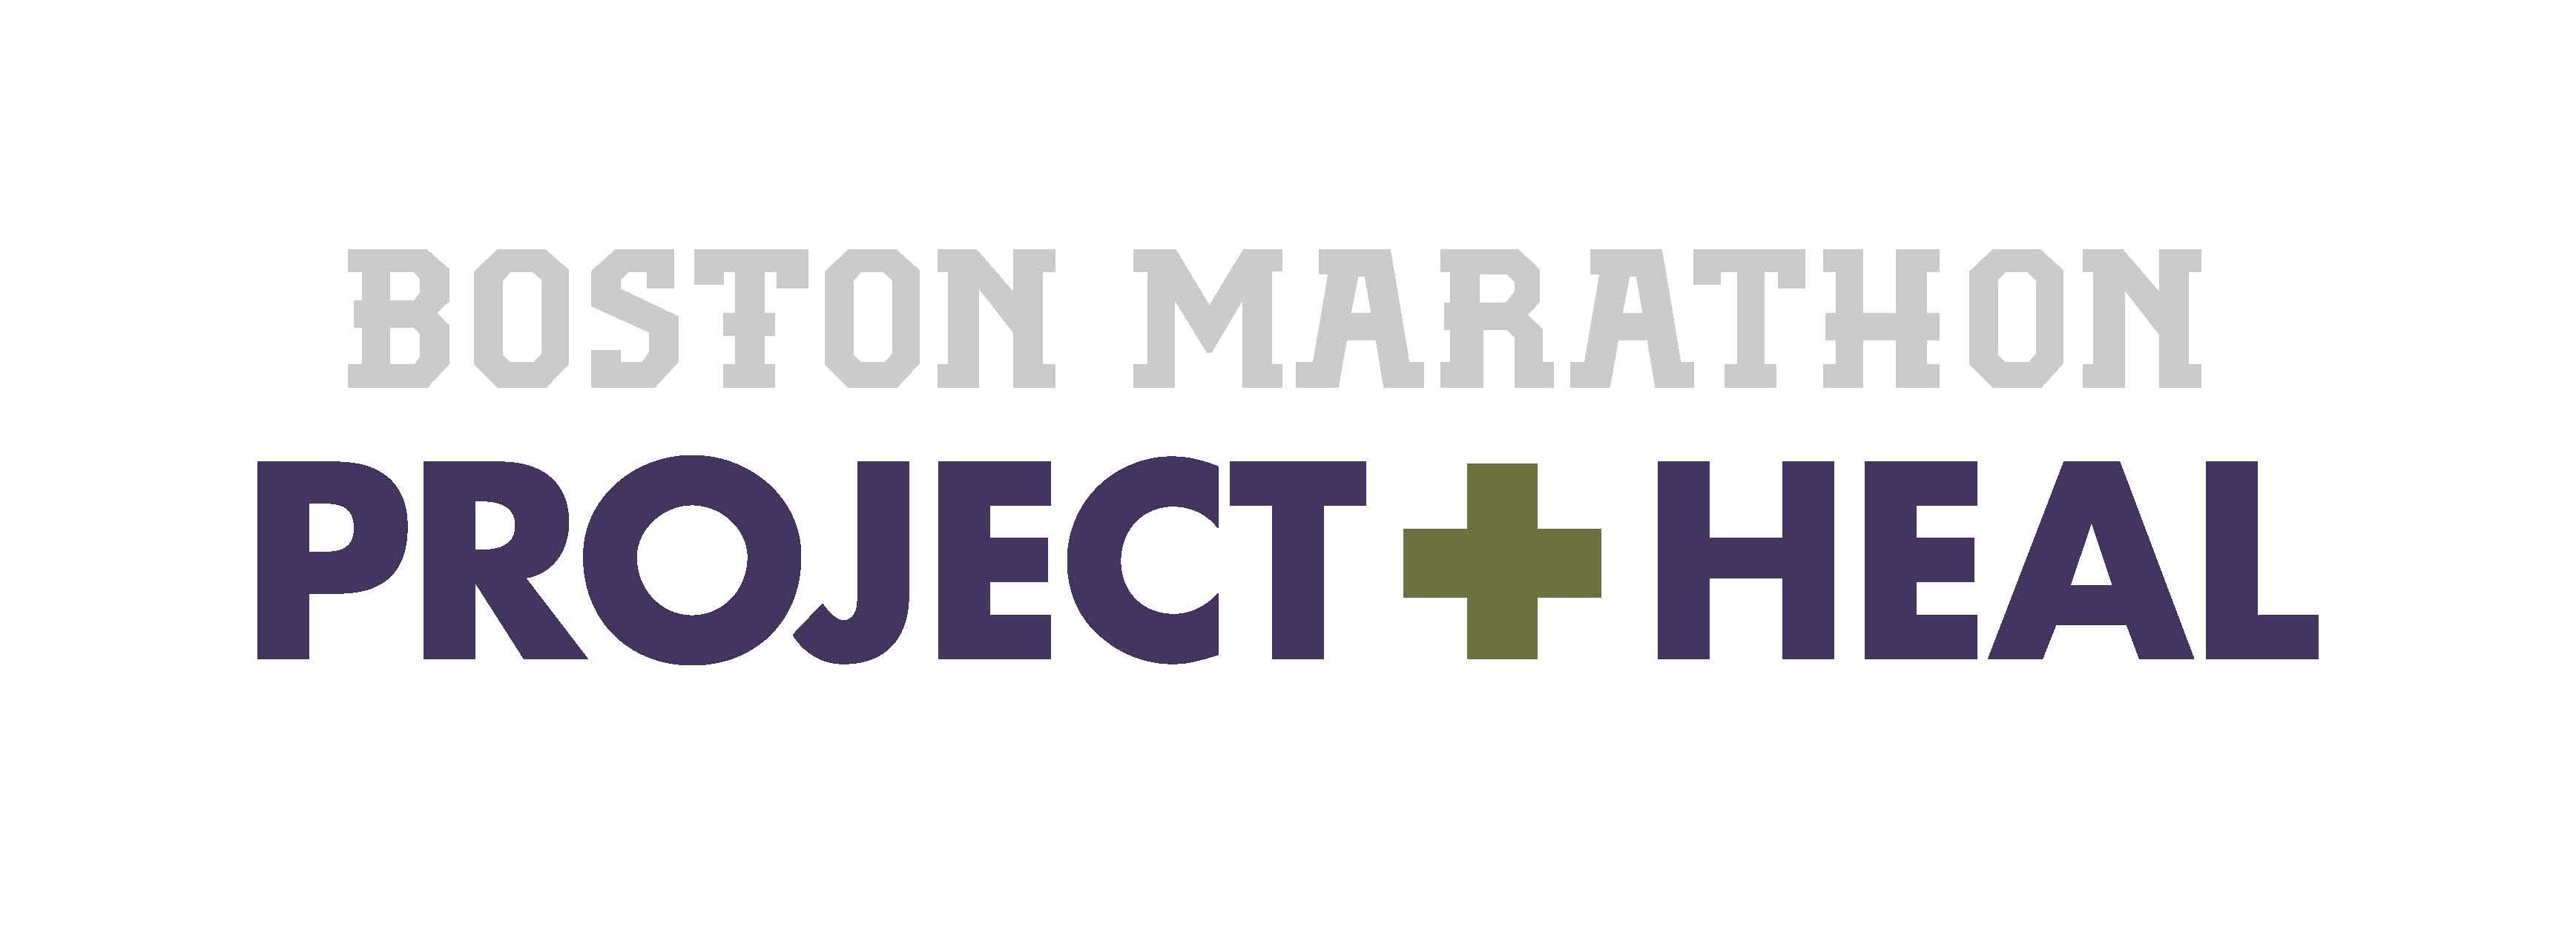 BostonMarathon_ProjectHeal